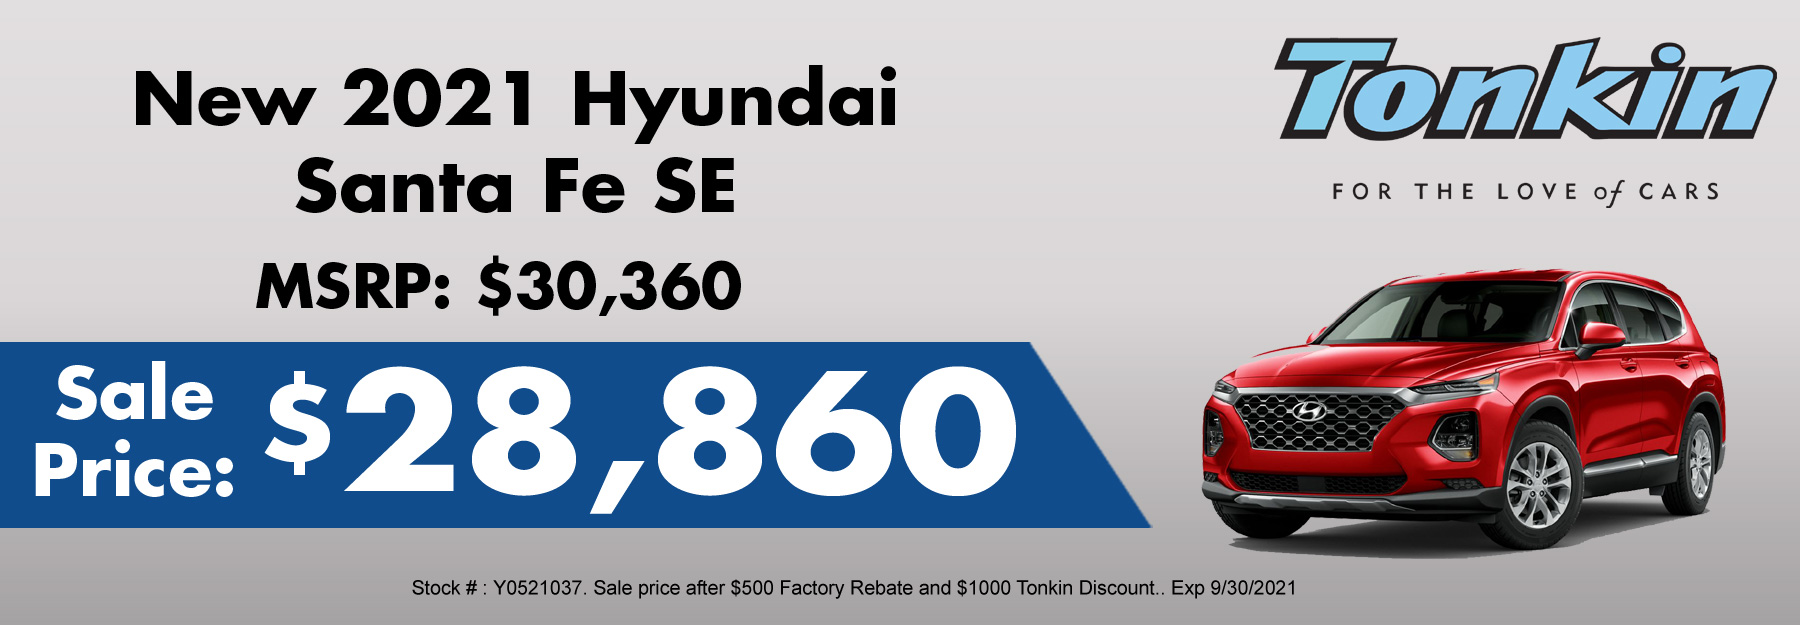 New Hyundai Santa Fe Special